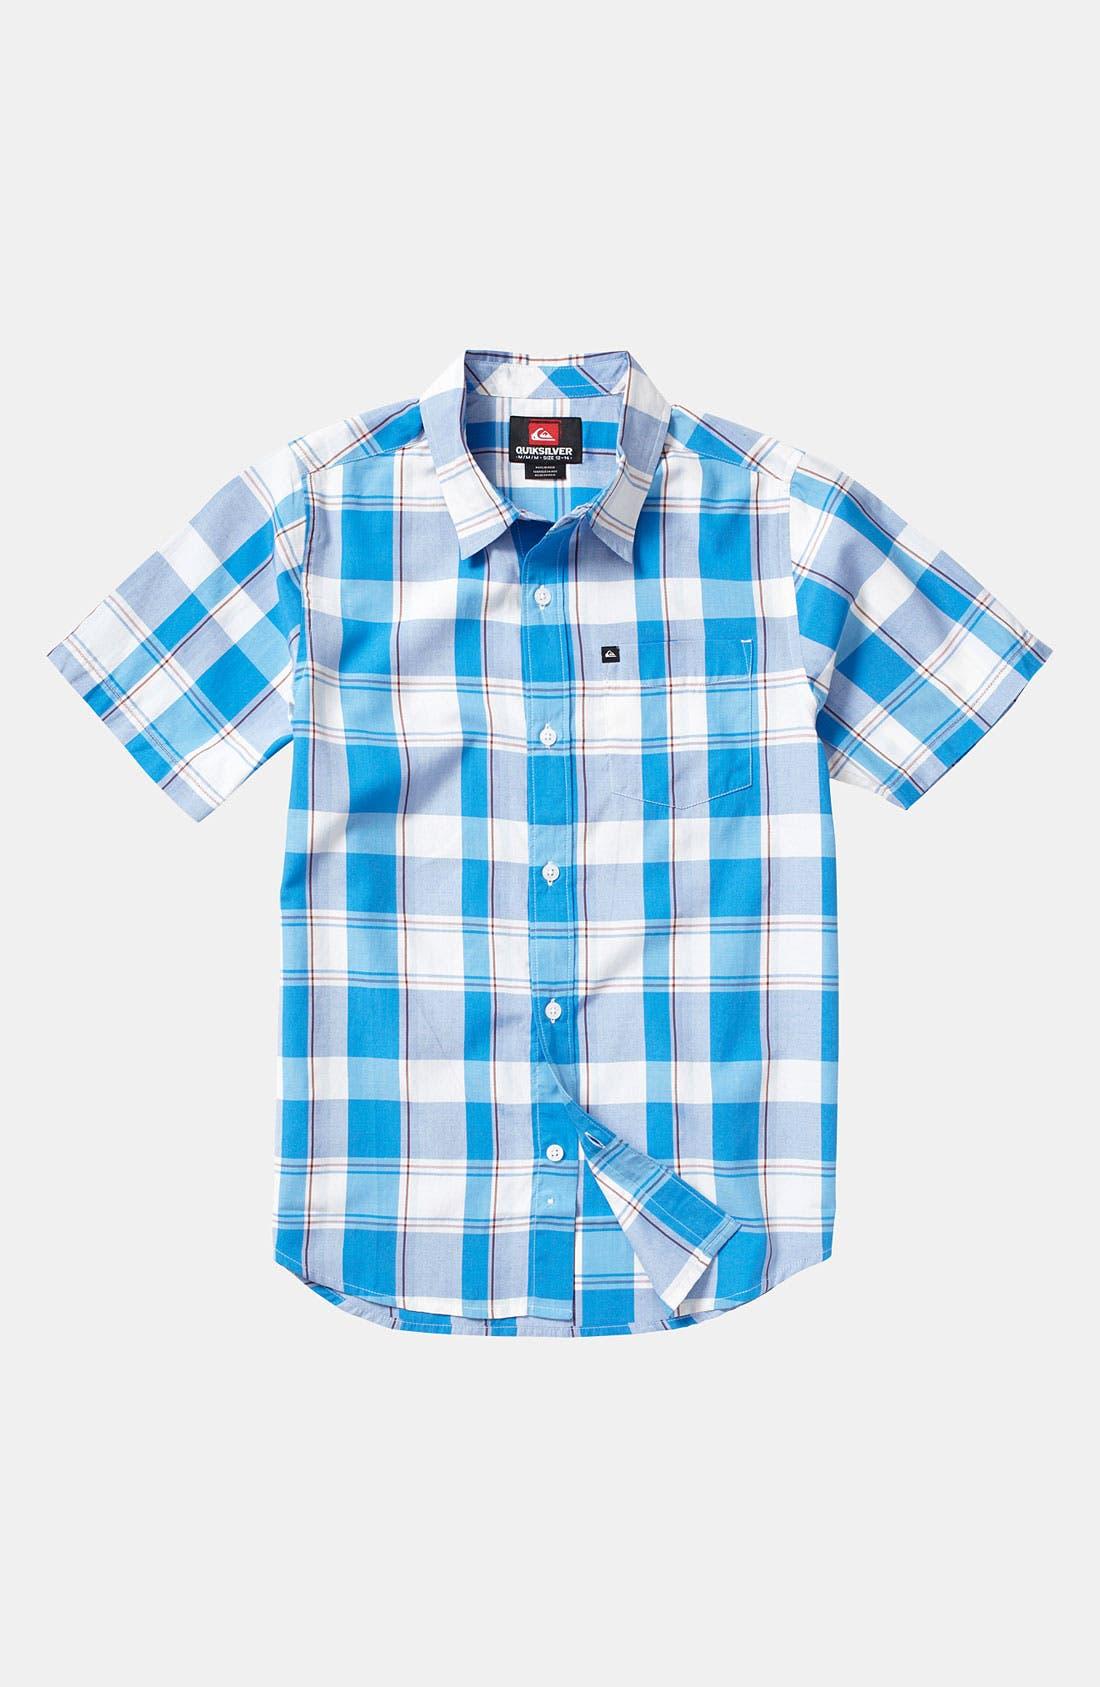 Alternate Image 1 Selected - Quiksilver Plaid Shirt (Little Boys)